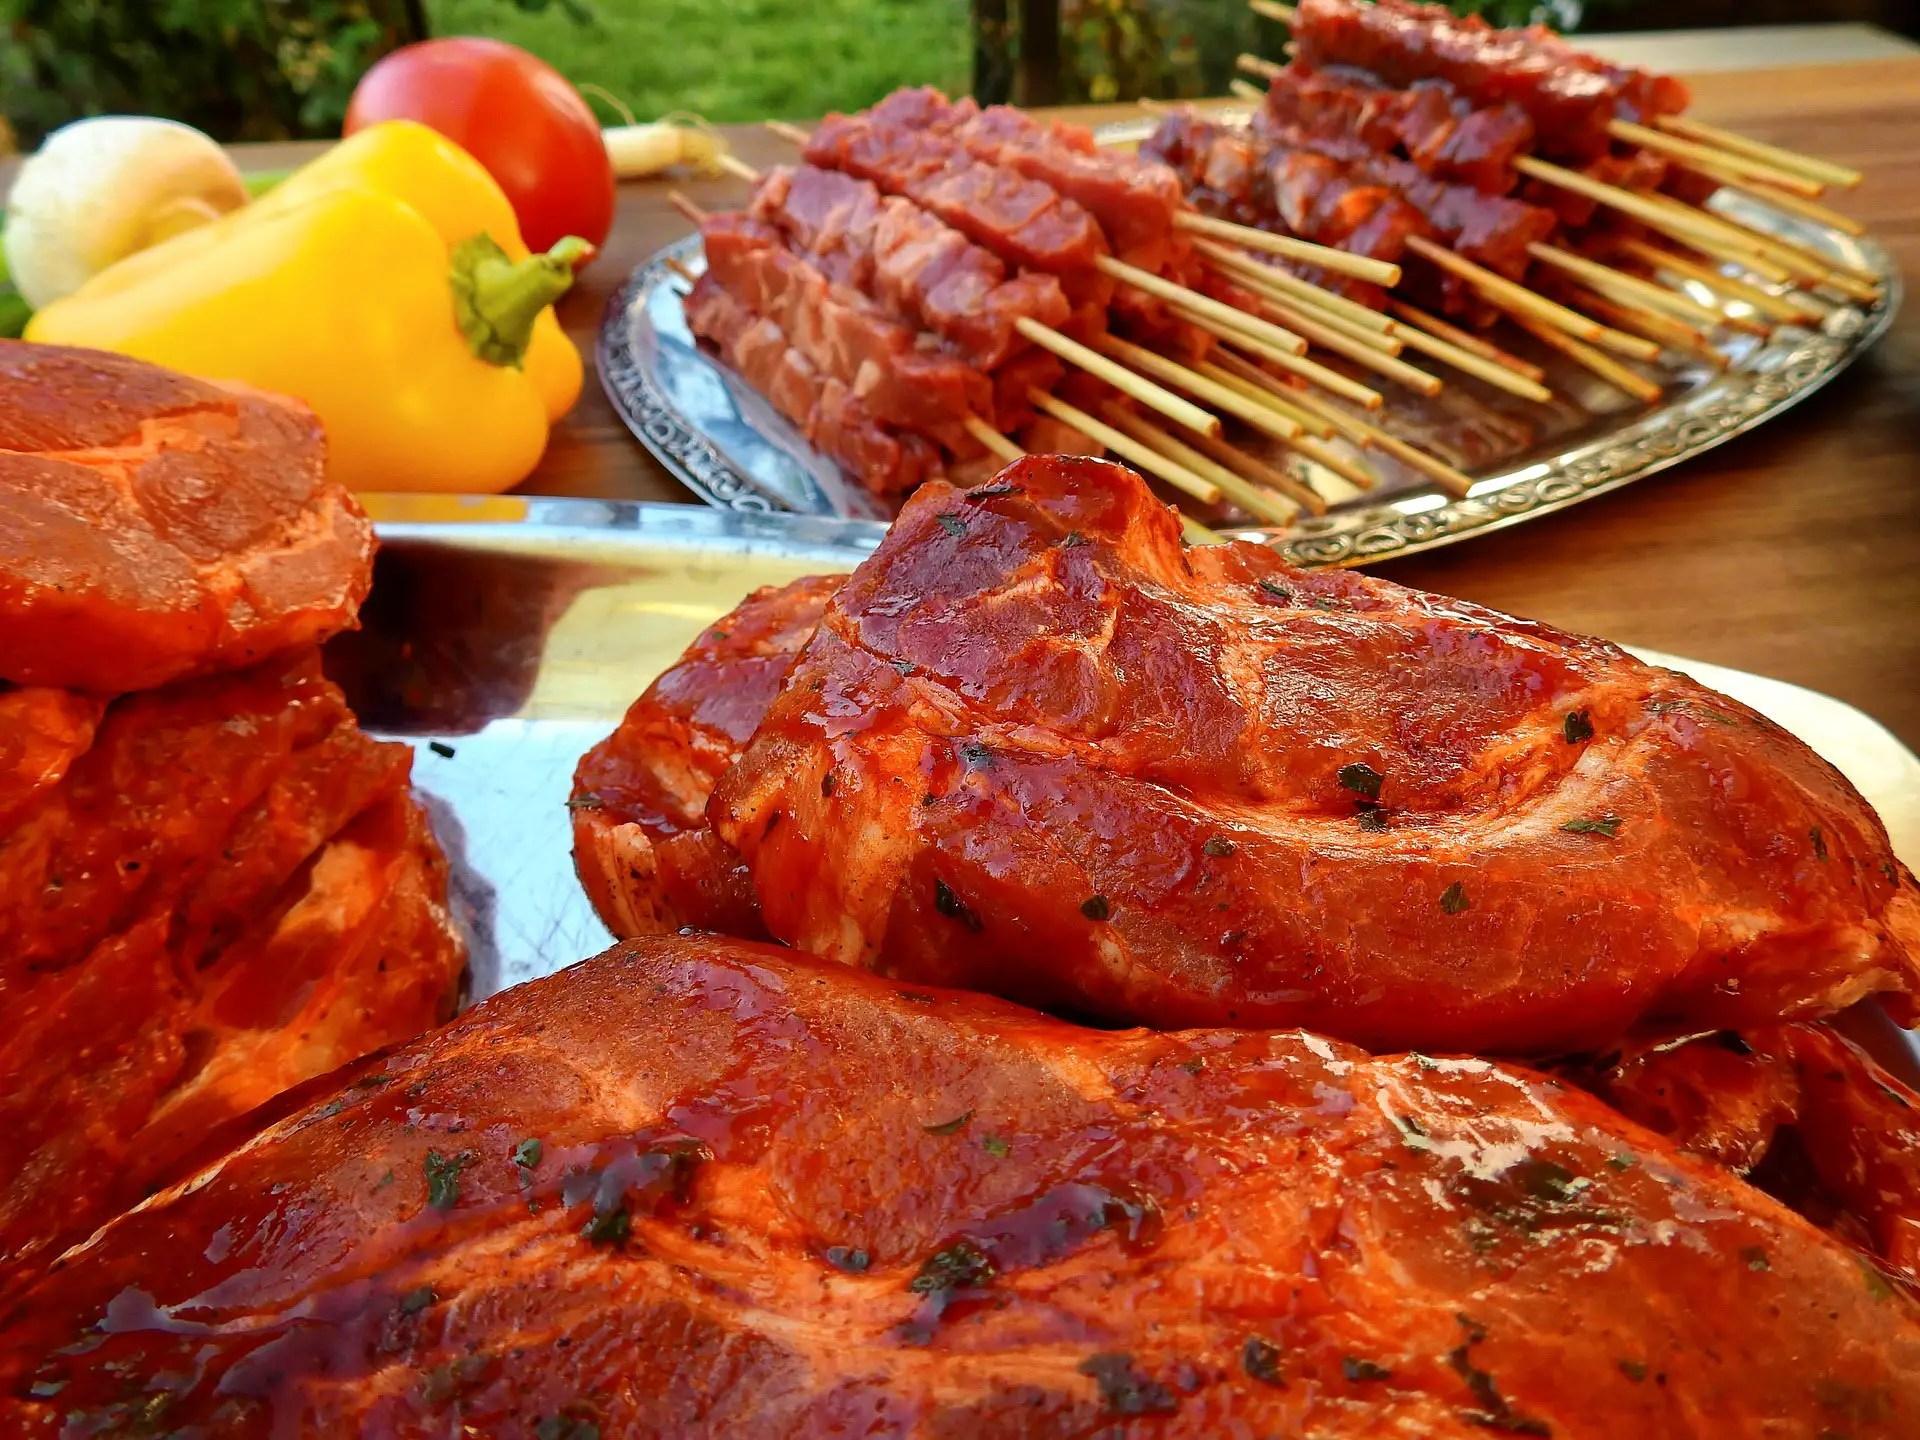 Weber Outdoor Küche Rezepte : Grill küche weber fahrbare outdoor küche küche outdoor küche ideen